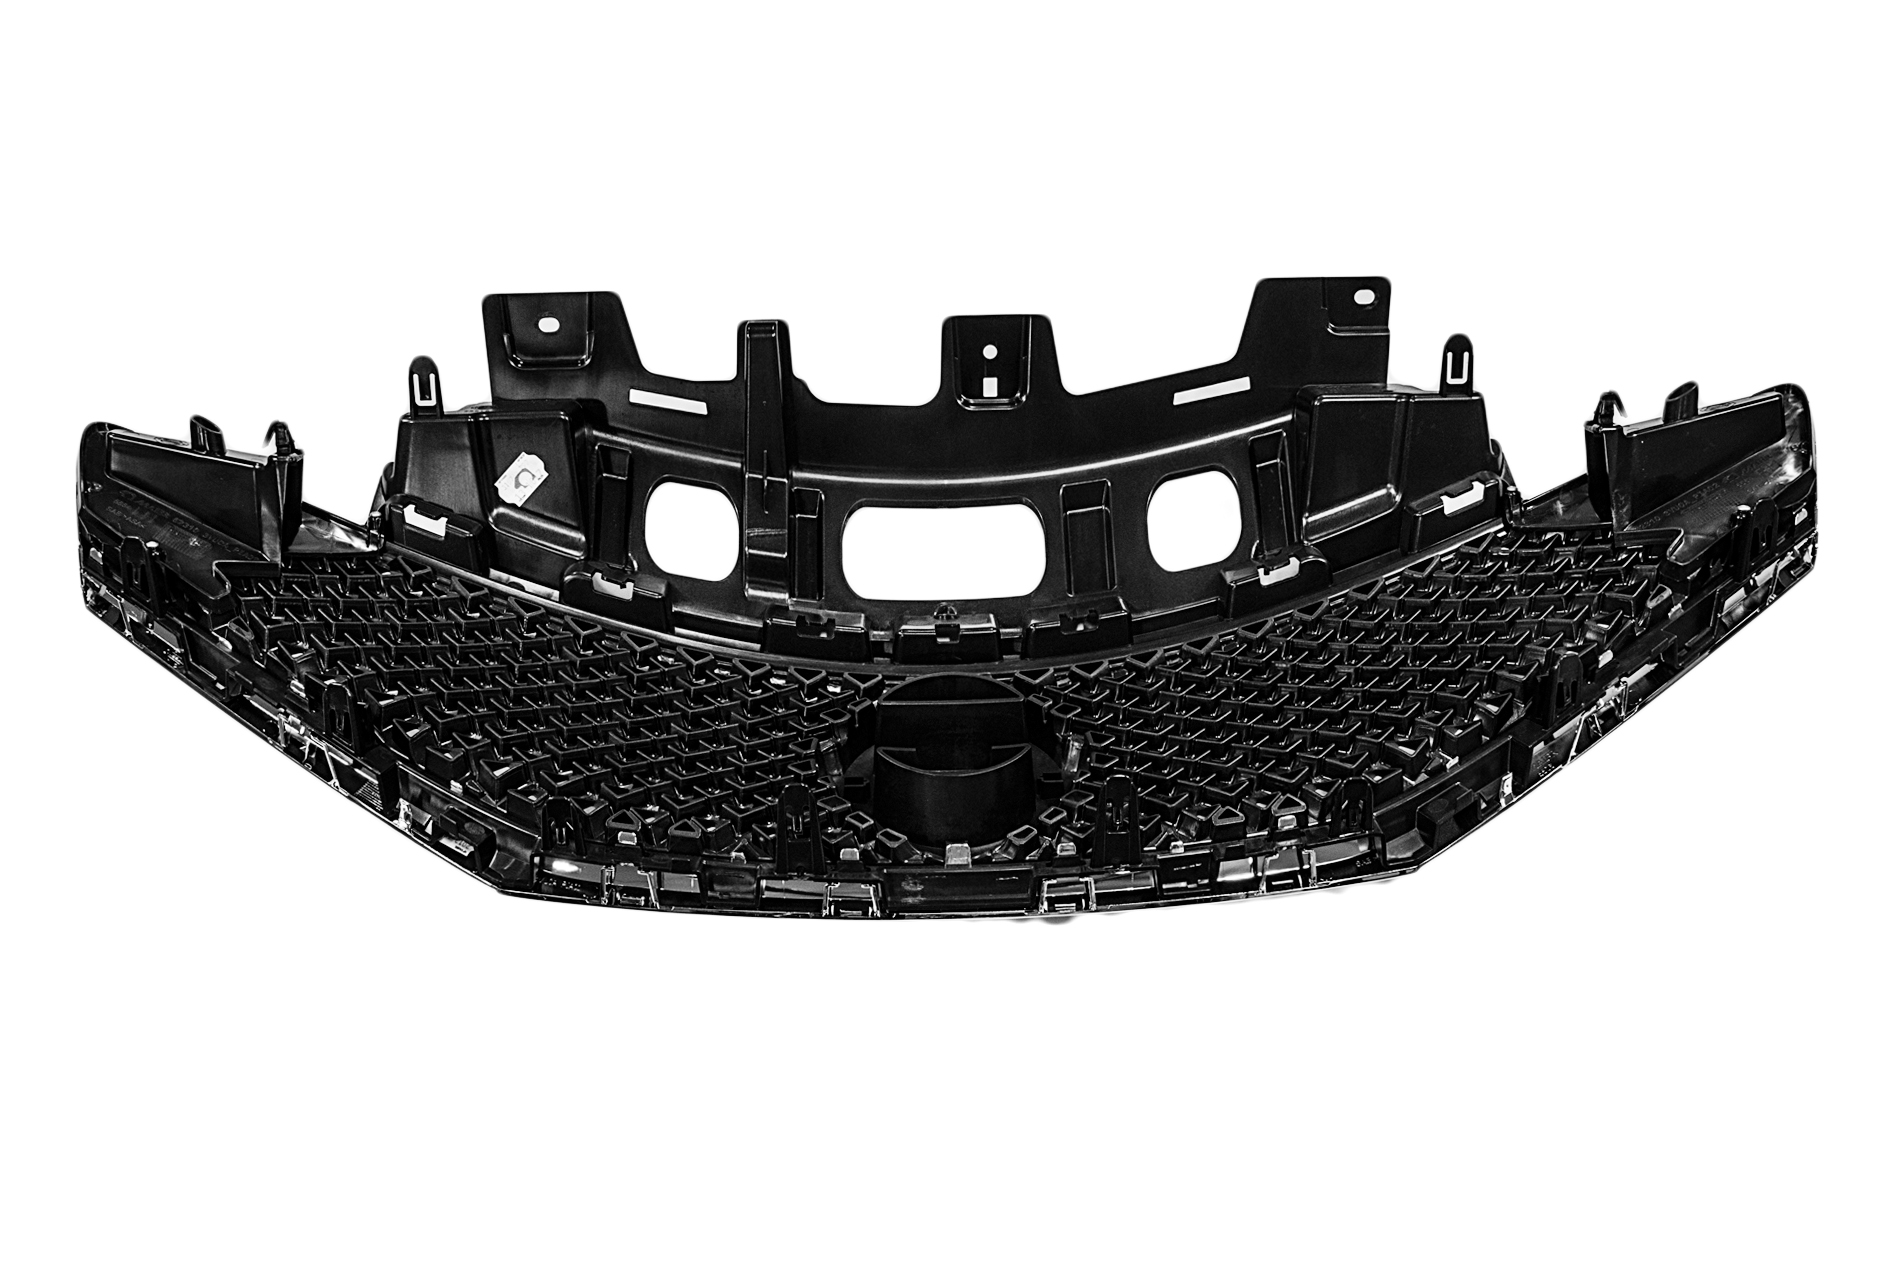 Nissan Genuine Note E12 Front Bumper Radiator Grille Panel Black Fuse Box Cover 623103vu0a Ebay